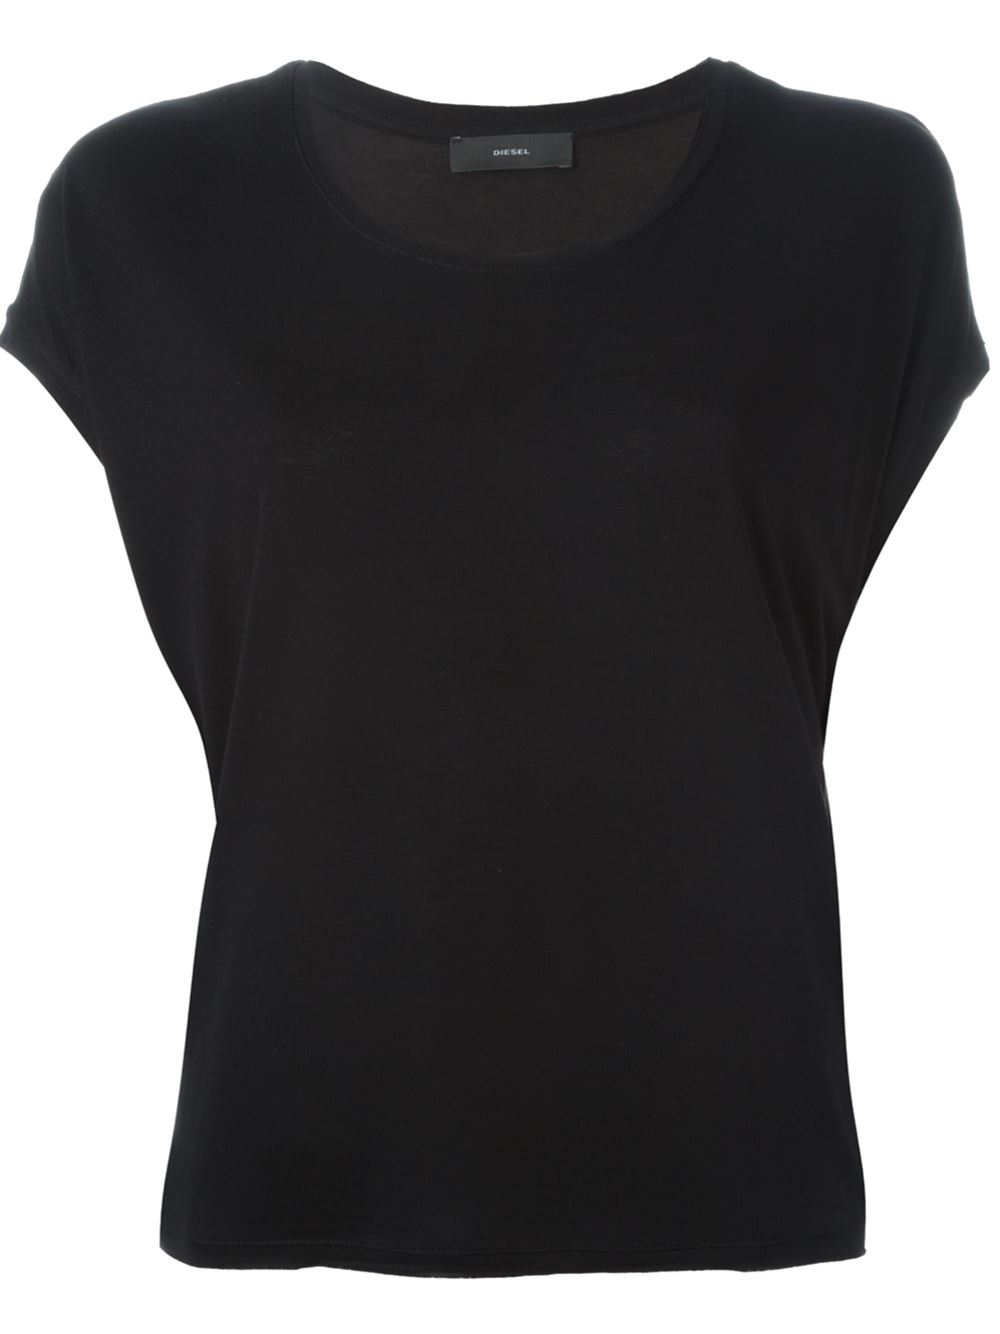 Lyst diesel scoop neck t shirt in black for Scoop neck t shirt